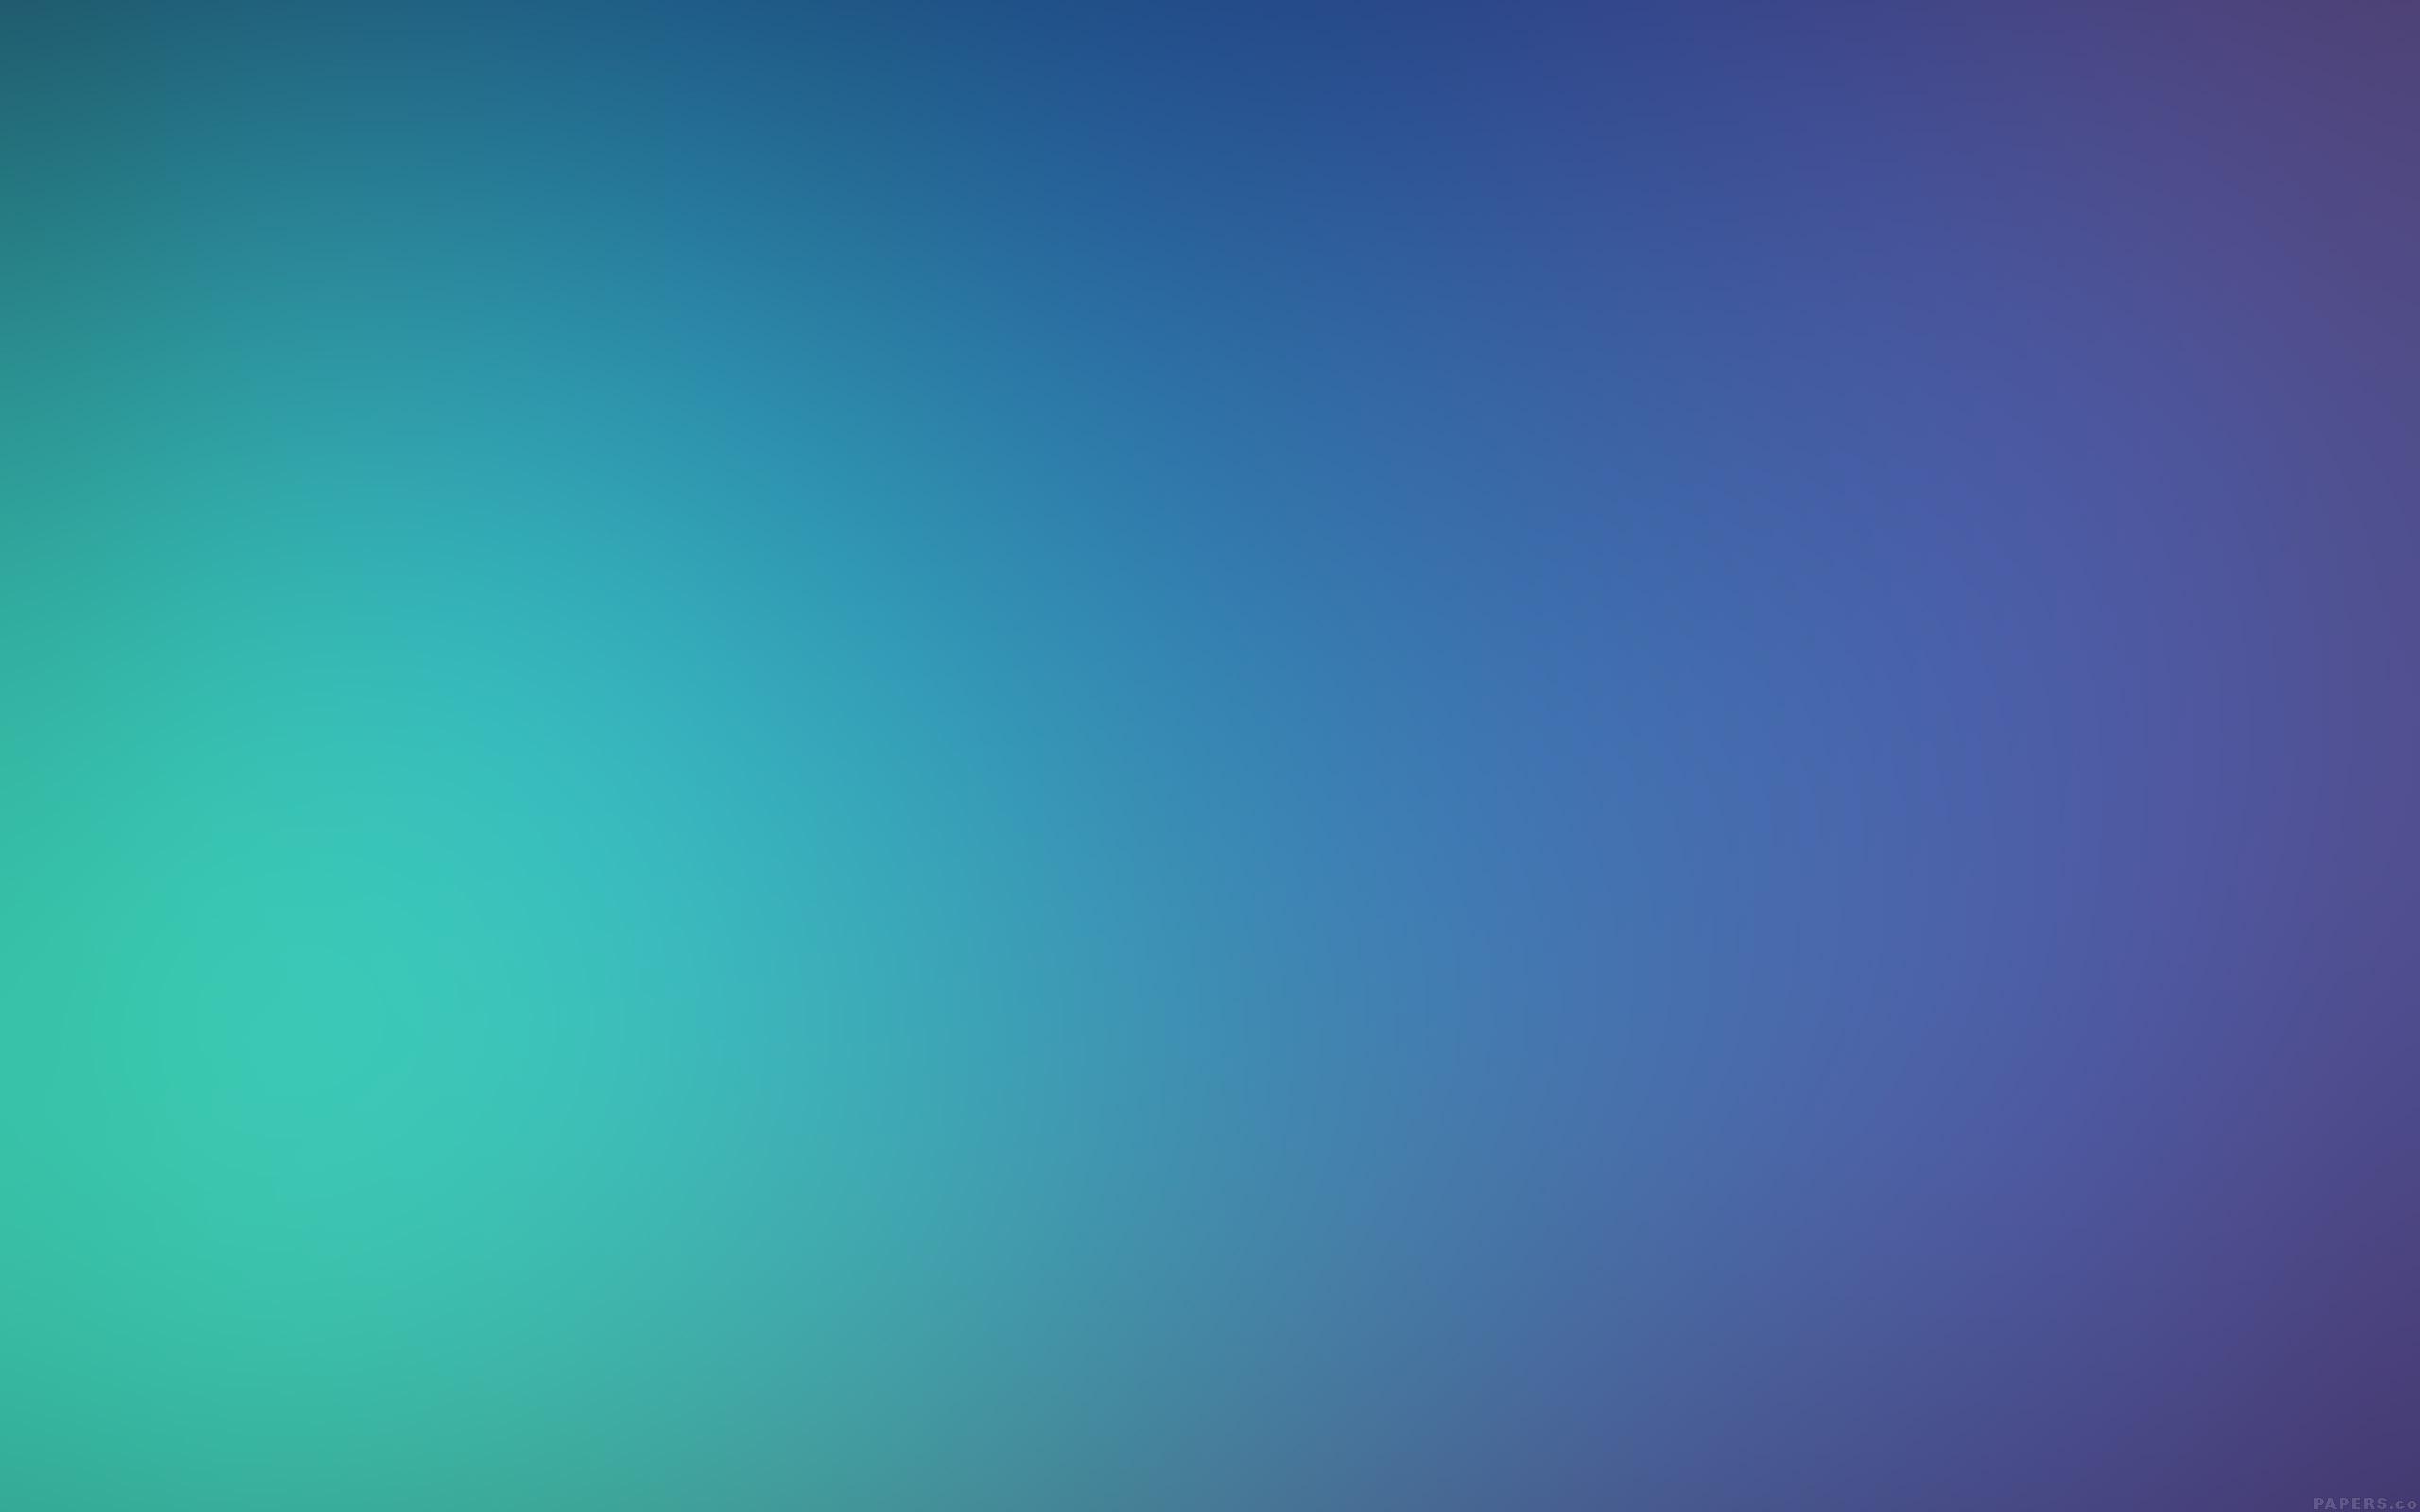 Moto G Plus >> sd69-blue-windows-green-gradation-blur - Papers.co